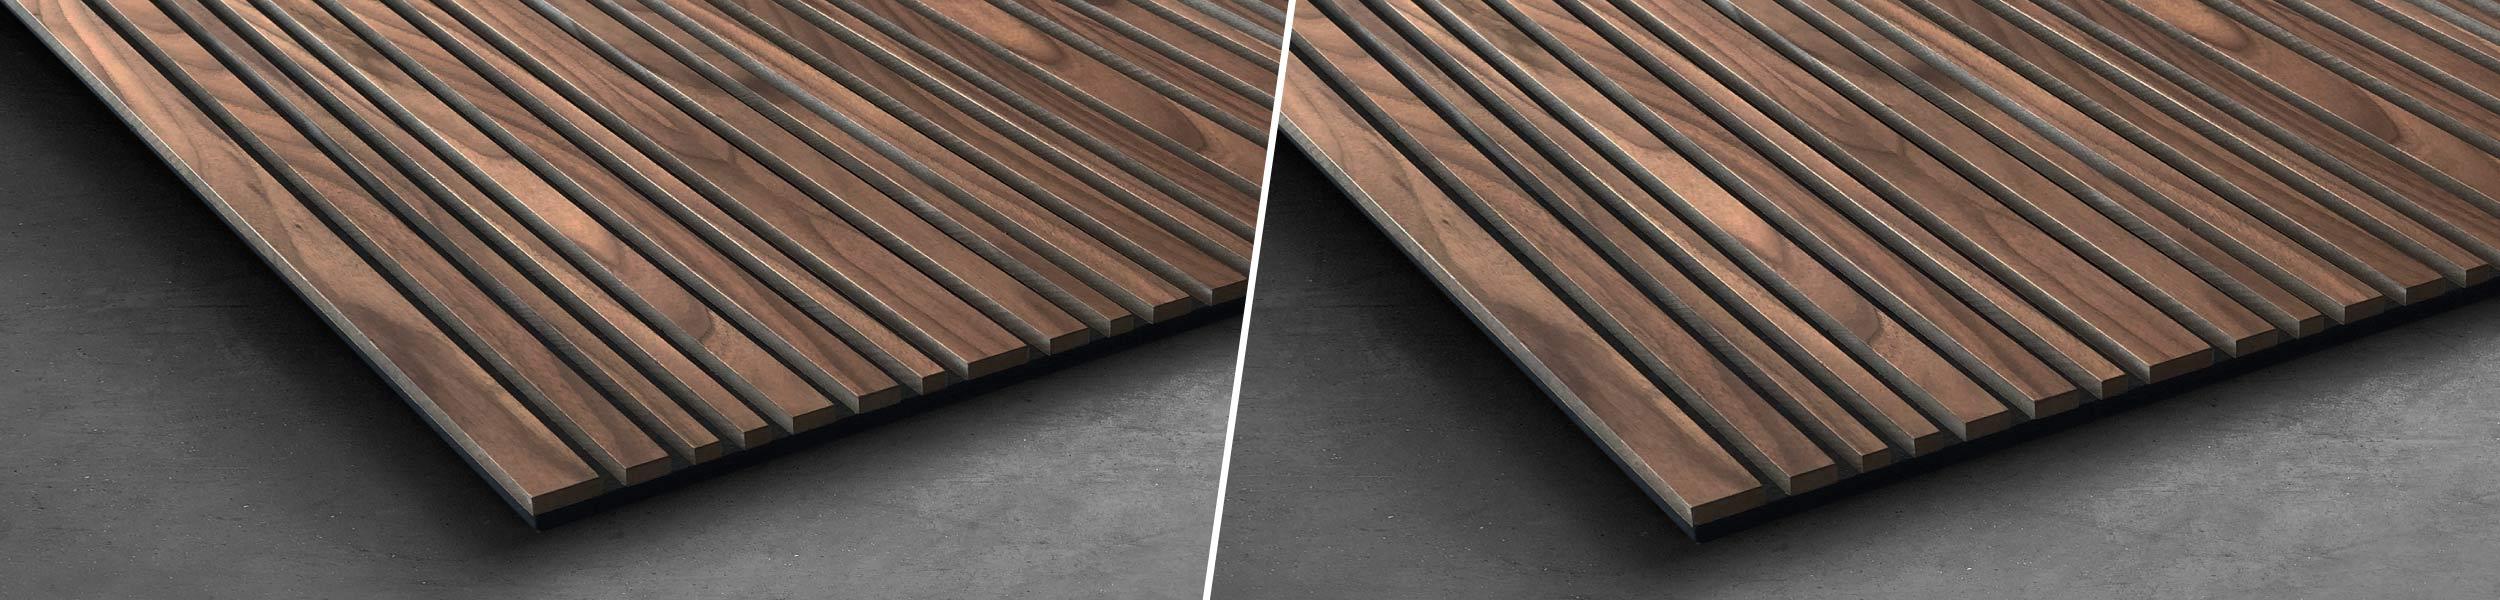 Artnovion product siena v panelling 3780884b6a